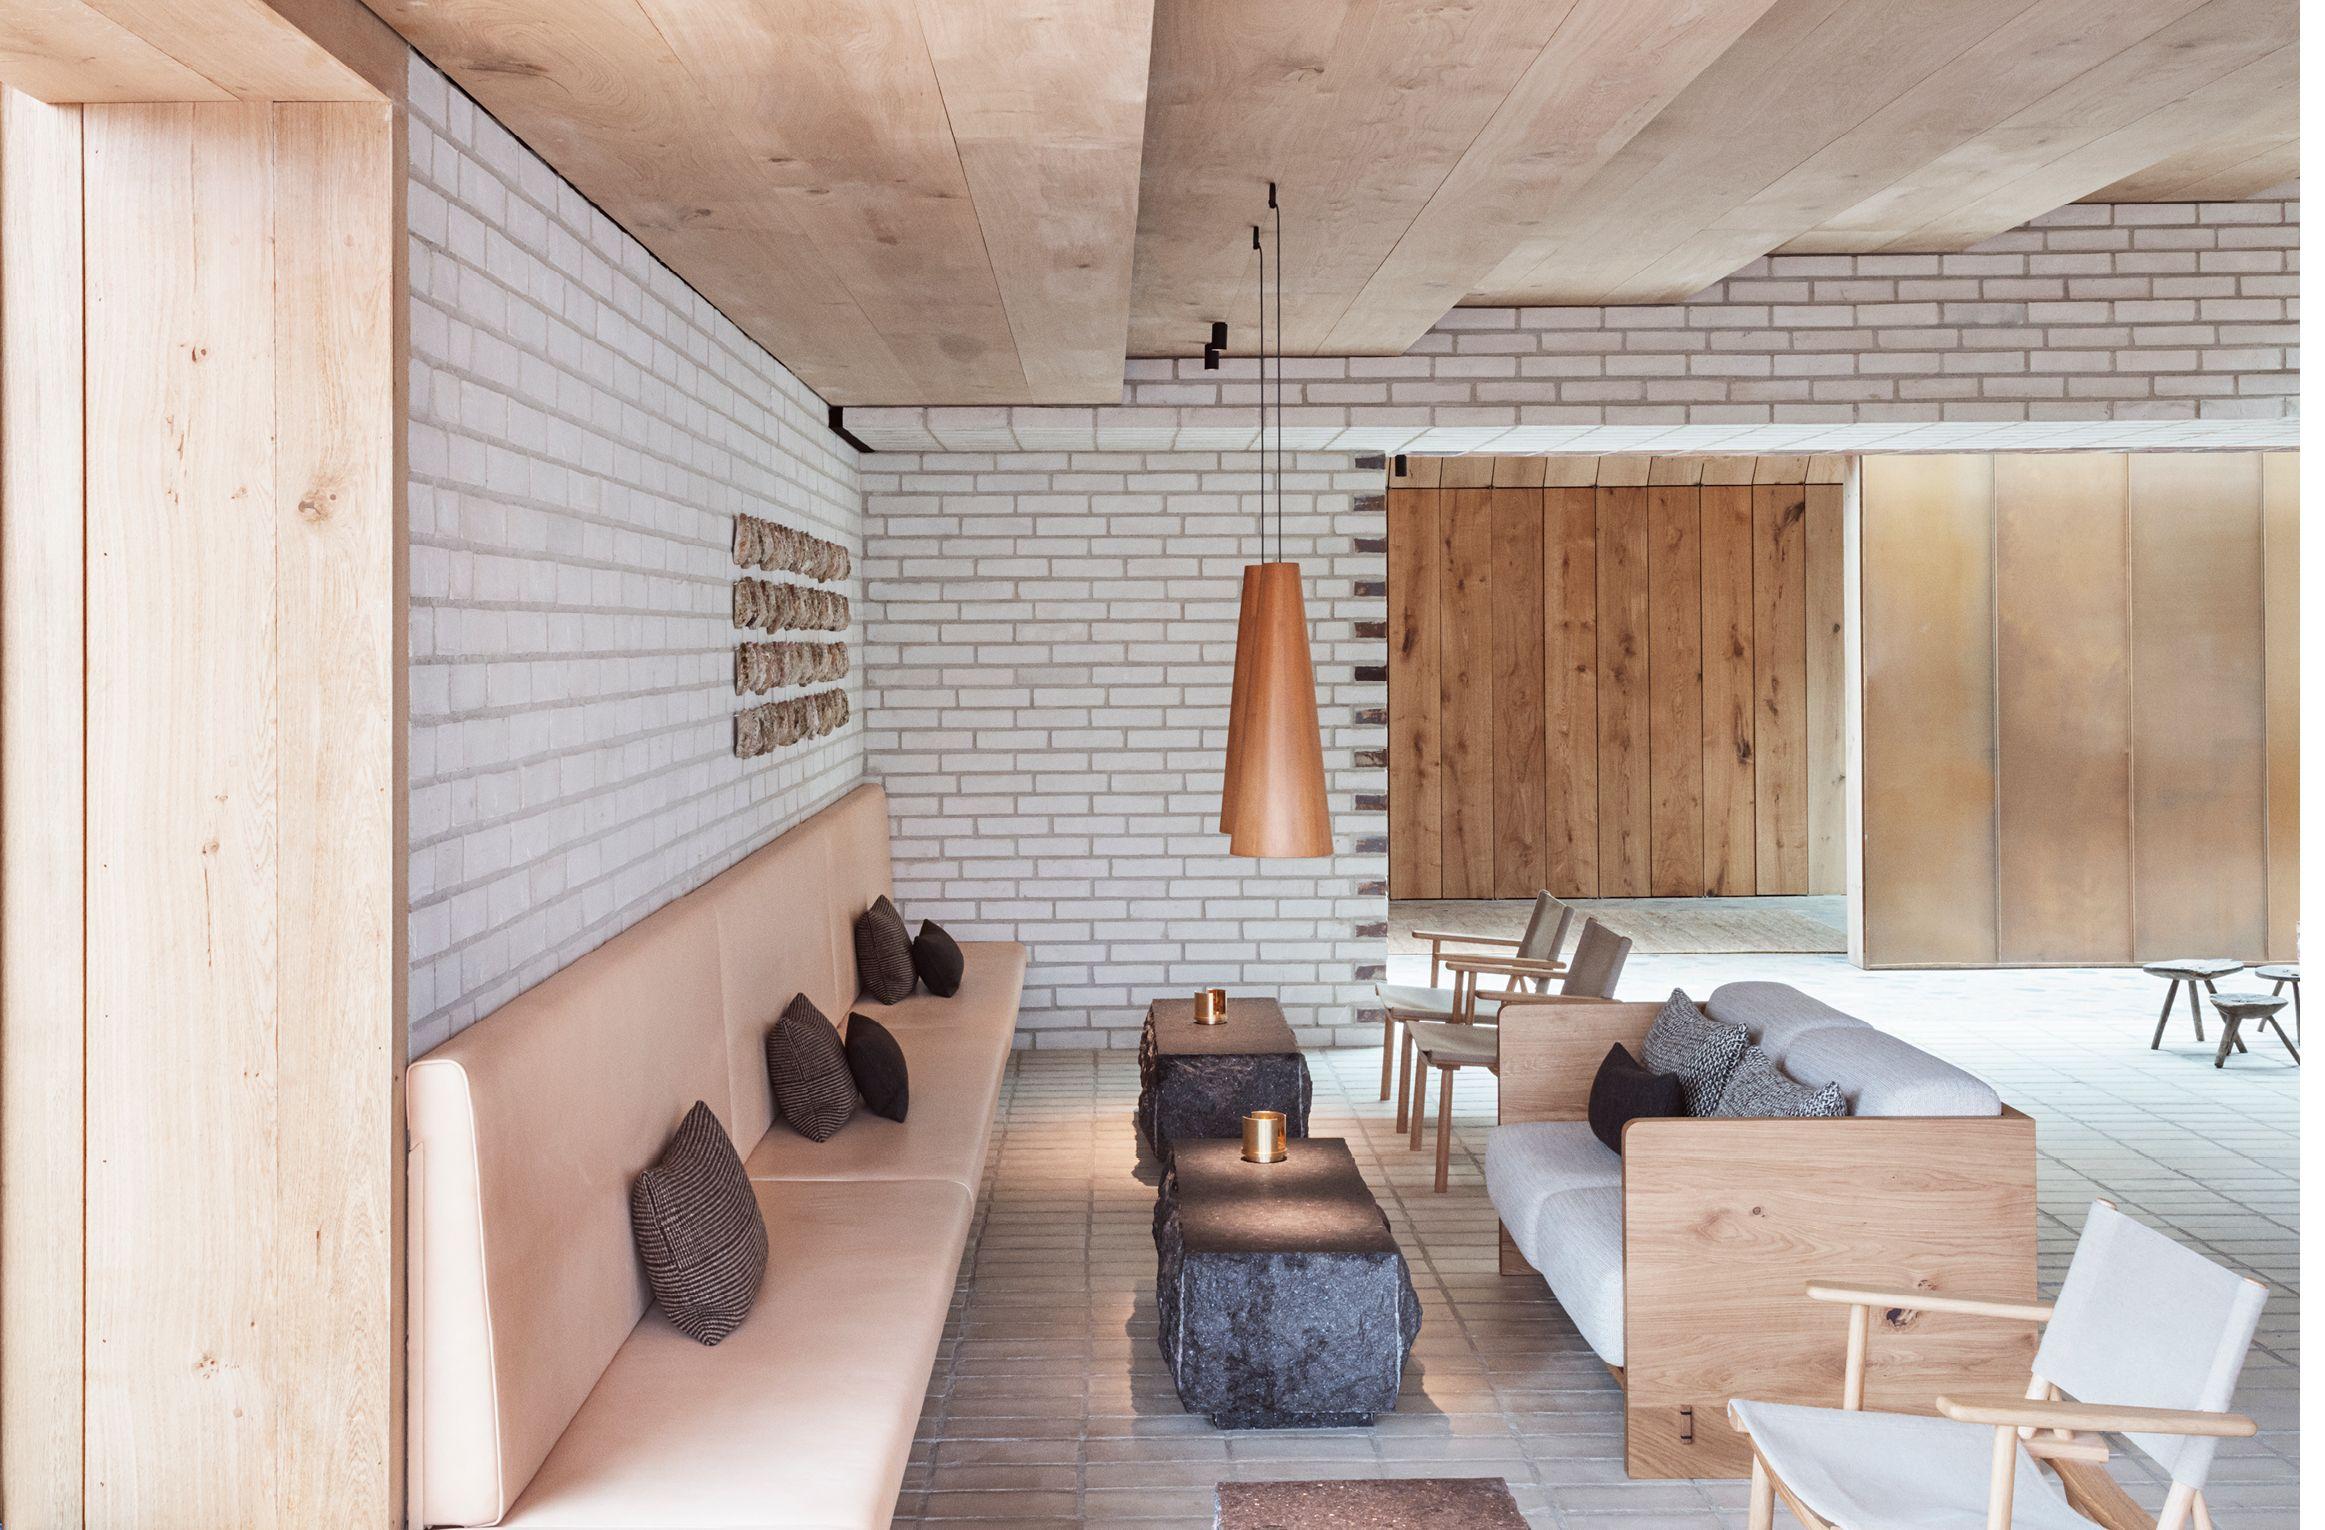 Noma Restaurant レストラン建築 レストランの内装 インテリアアイデア